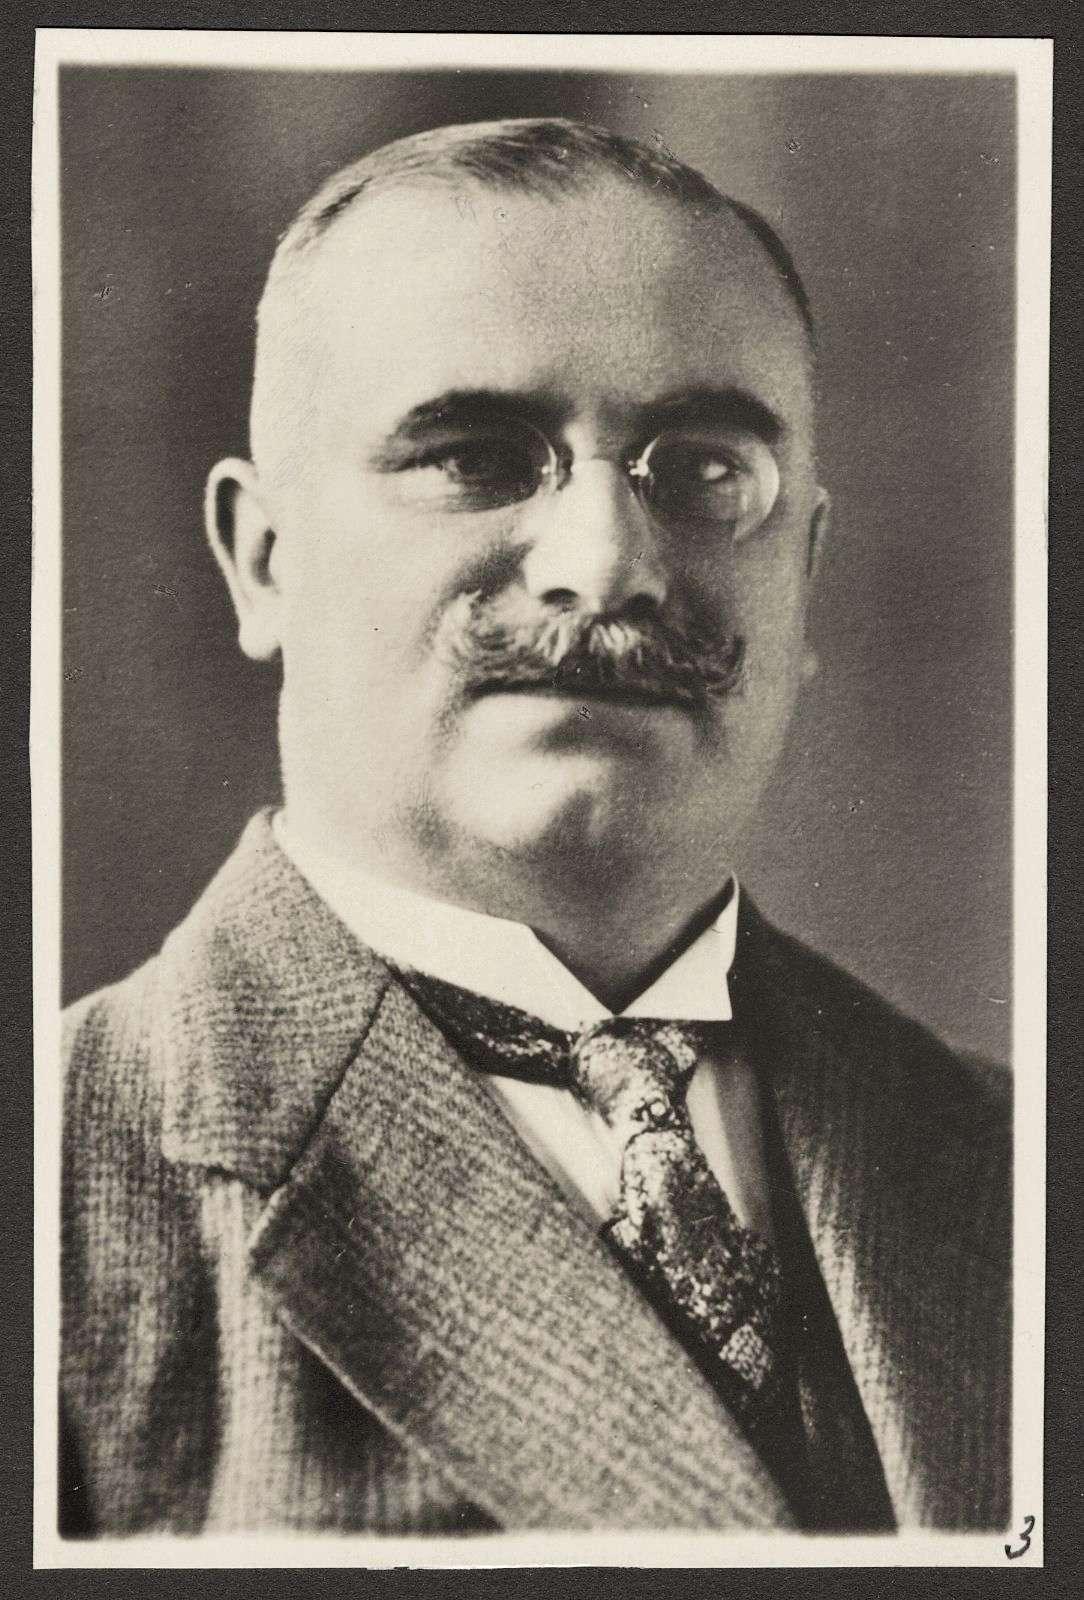 Digele, Gottlieb, Bild 1